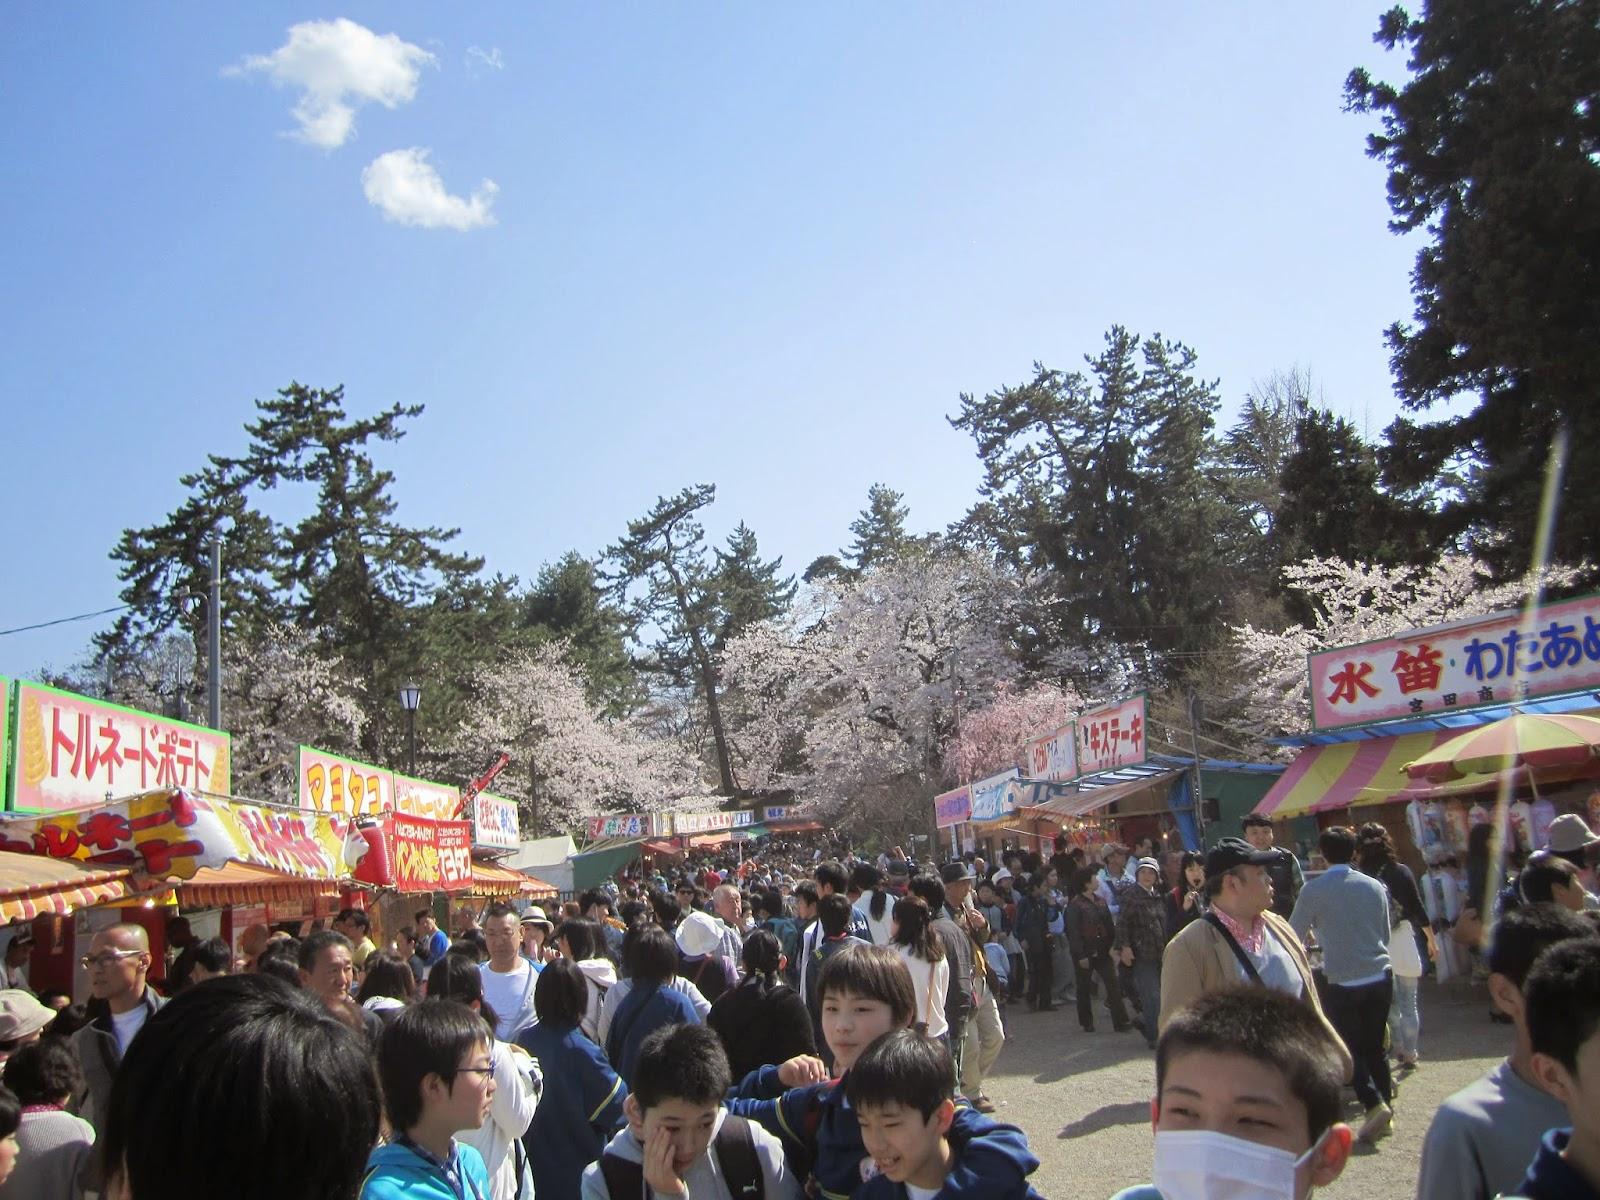 Hirosaki Cherry Blossom Festival Food Stalls 弘前さくらまつり 屋台